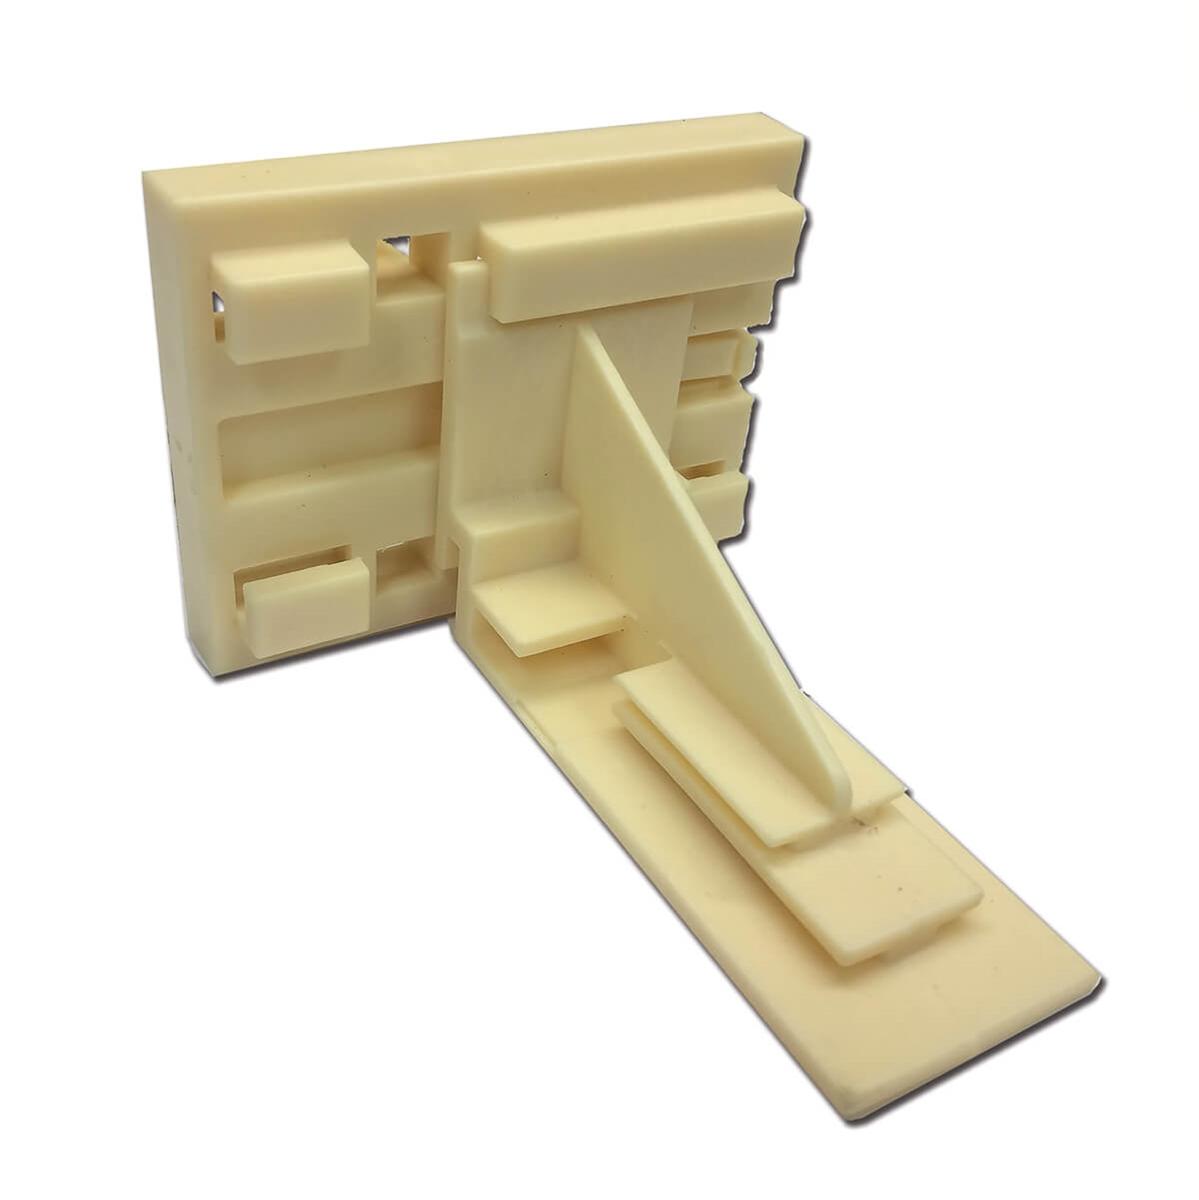 Wondrous Undermount Adjustable Rear Guide Socket Pair Download Free Architecture Designs Embacsunscenecom